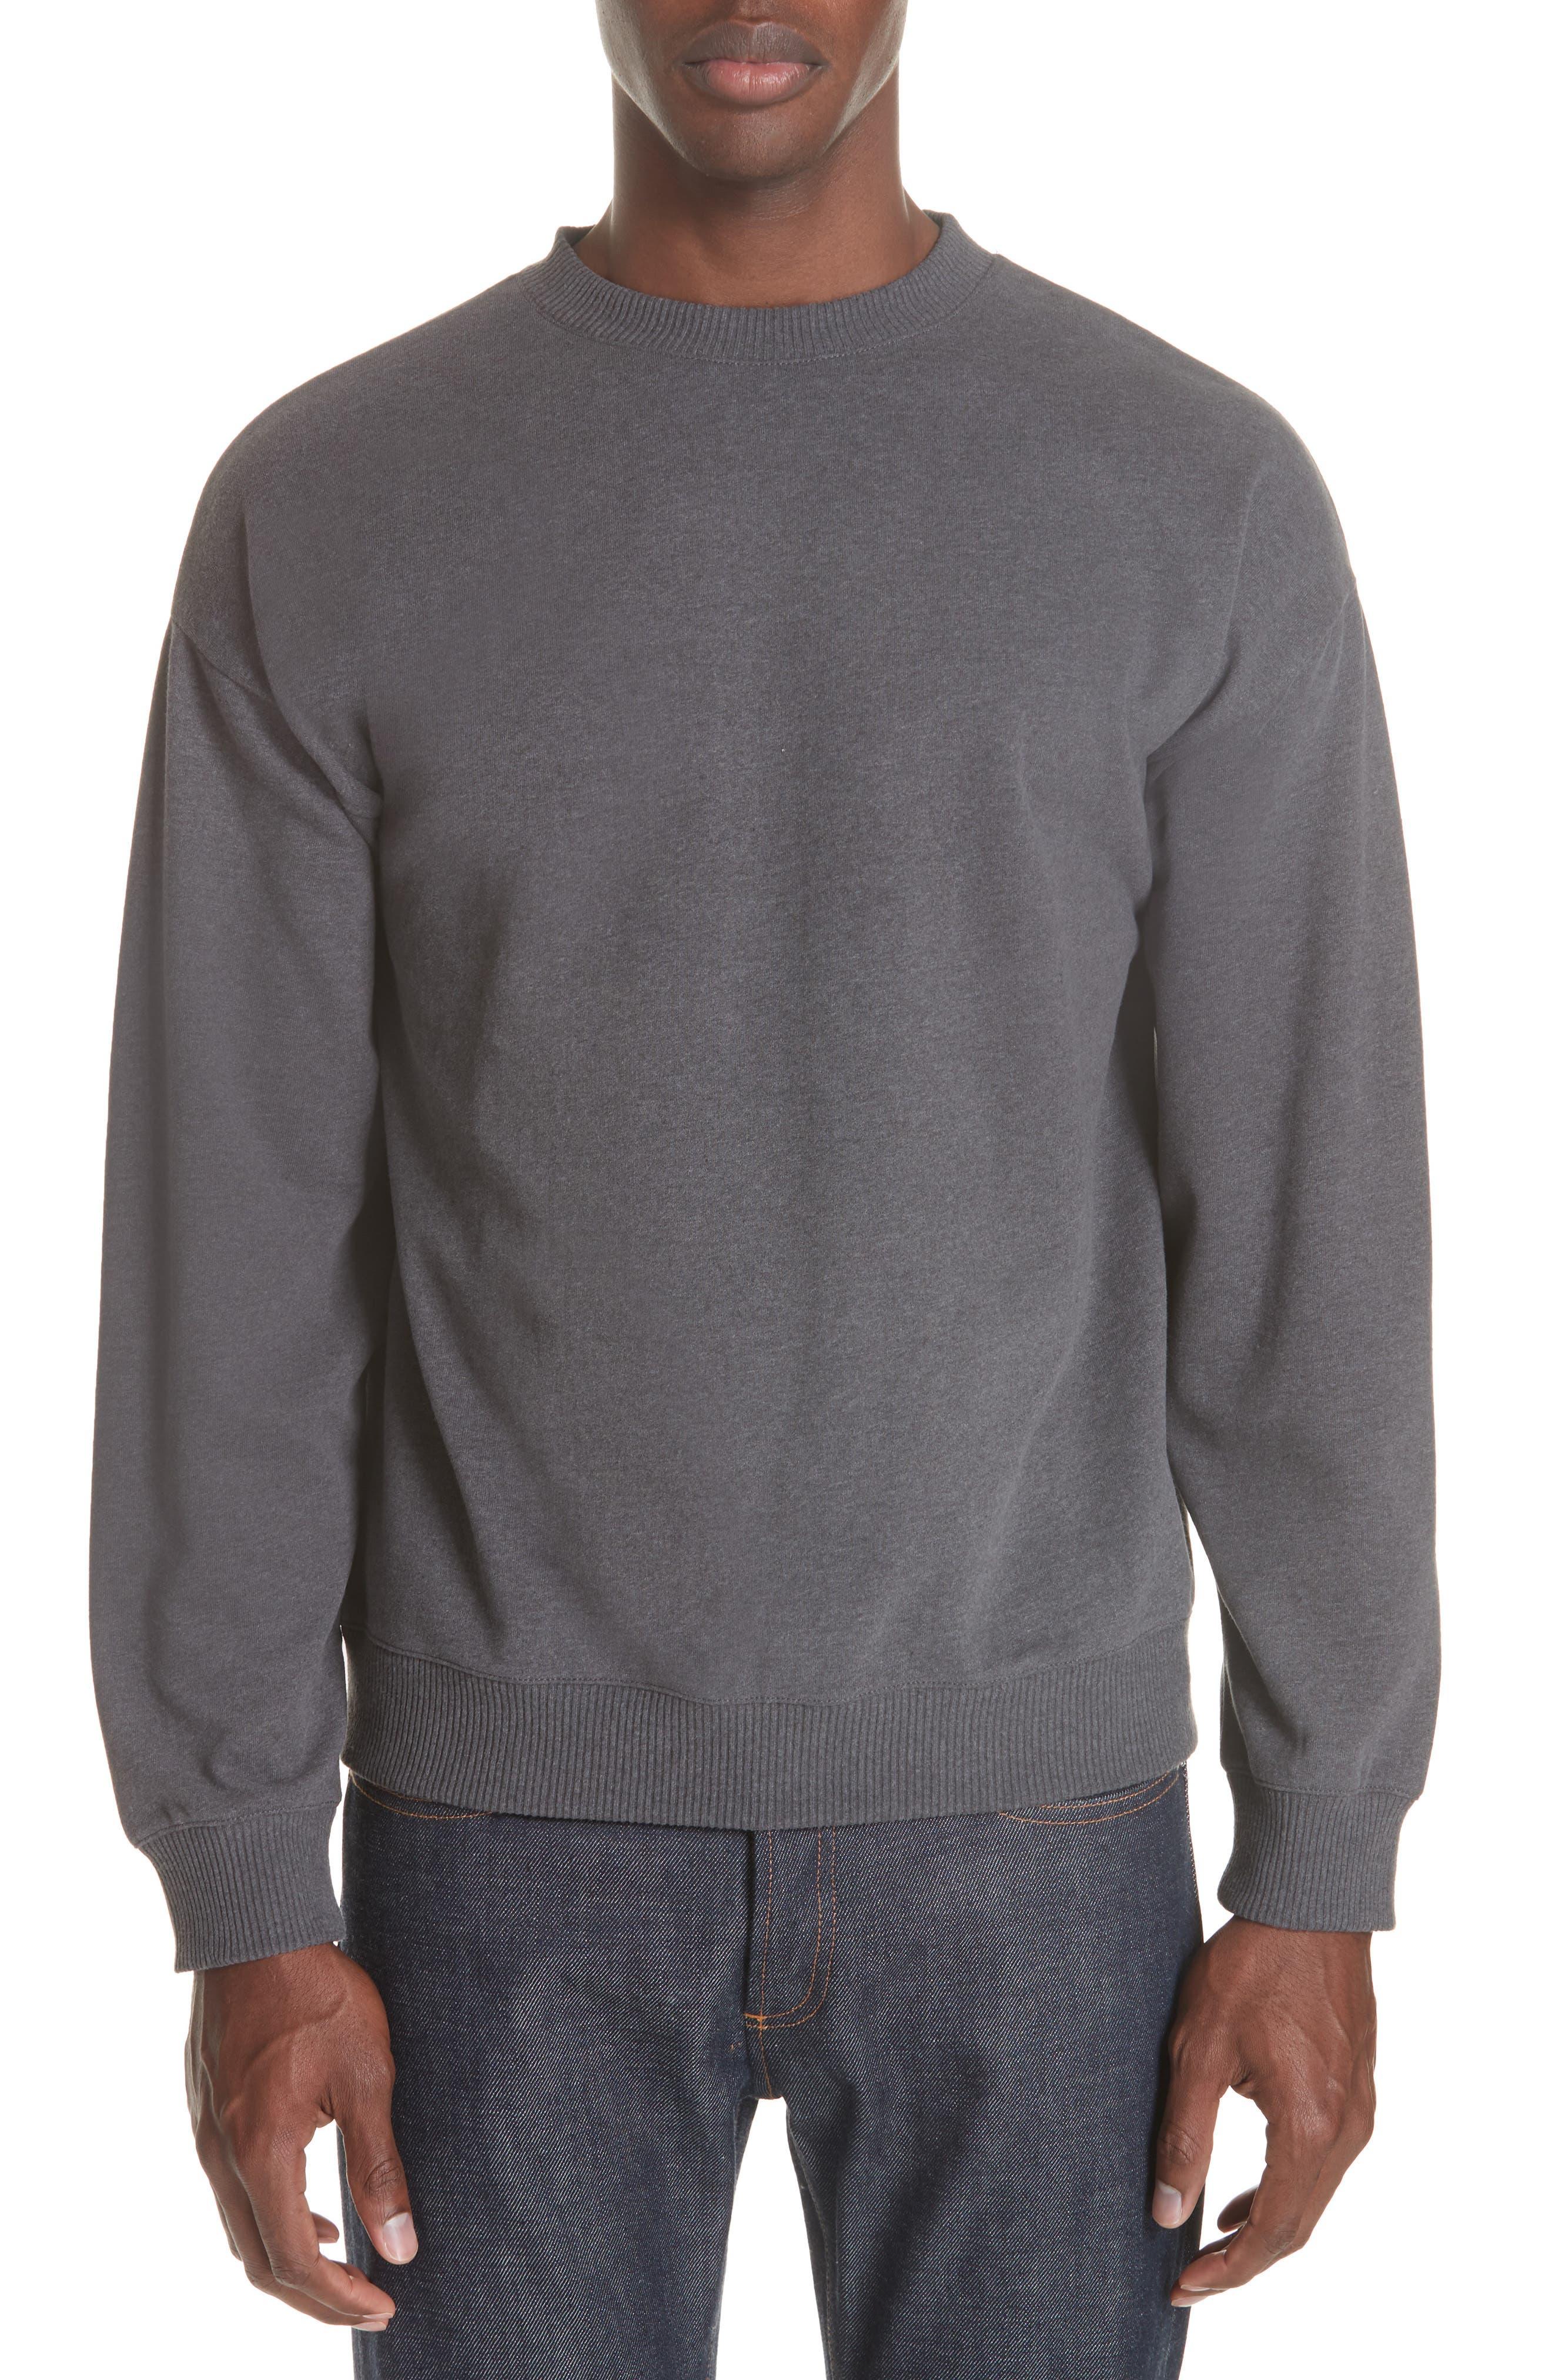 Roman Crewneck Sweatshirt,                             Main thumbnail 1, color,                             ANTHRACITE LAD